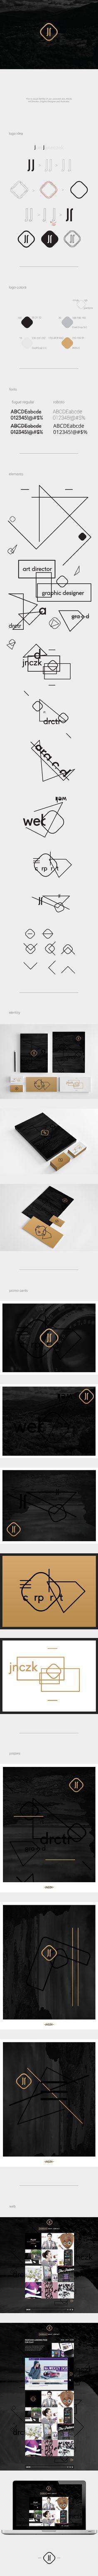 JNCZK - Visual Identity | Designer: J N CZ K